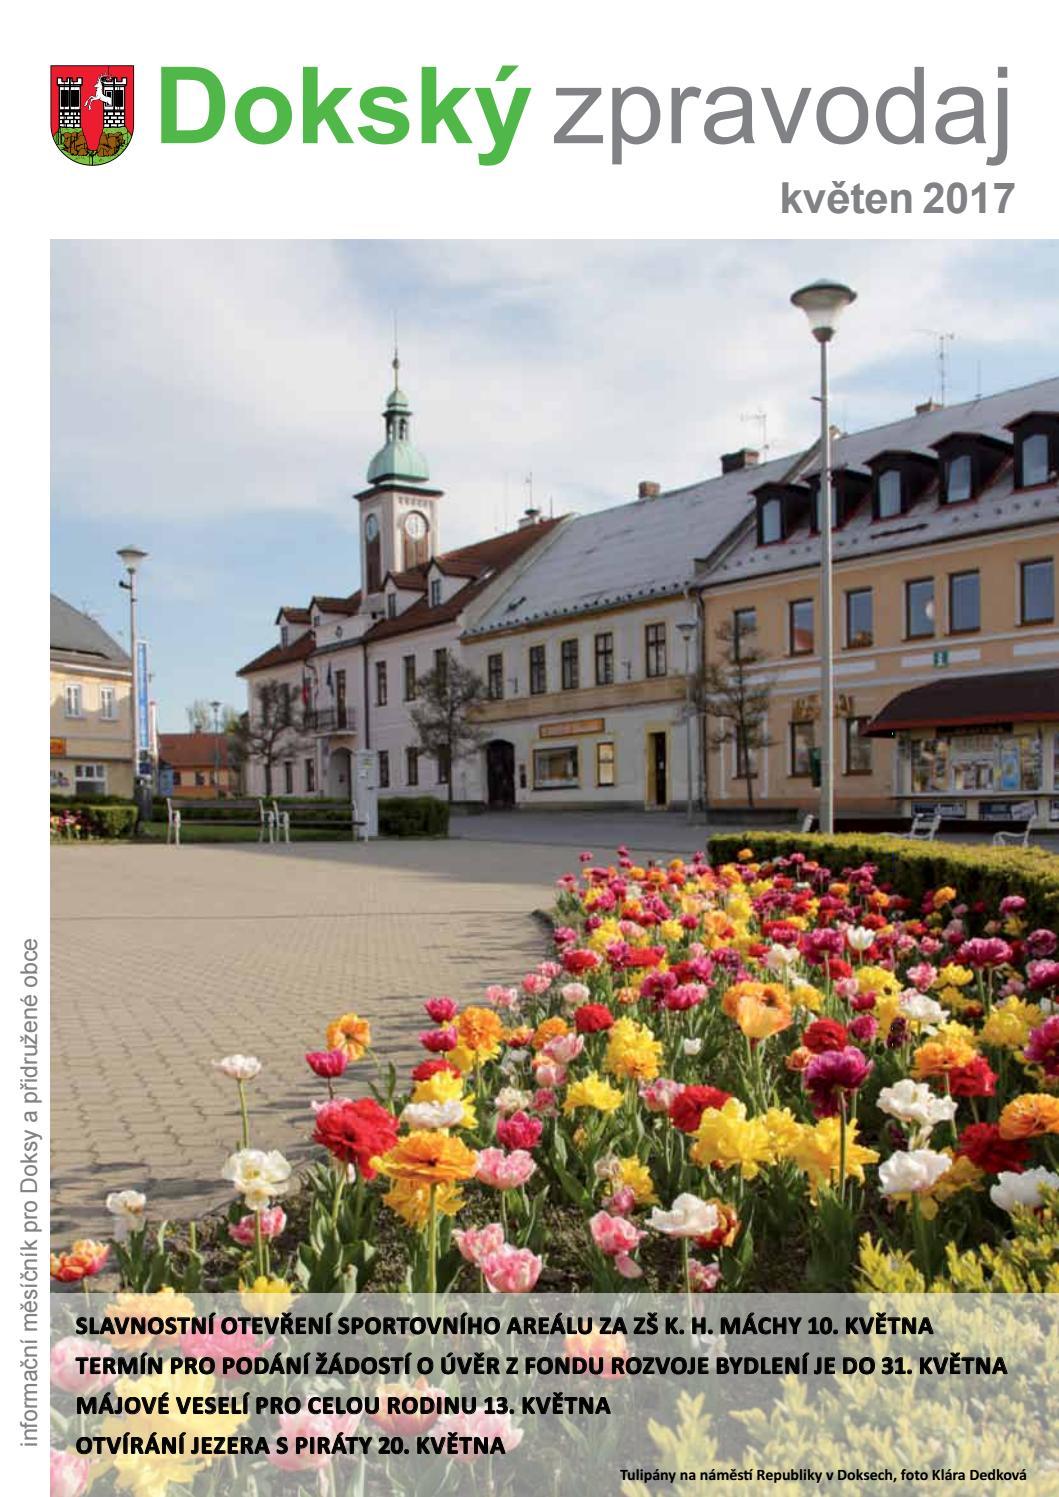 Dokský zpravodaj 05 2017 by Kulturadoksy.cz - issuu 203c8b0eb2